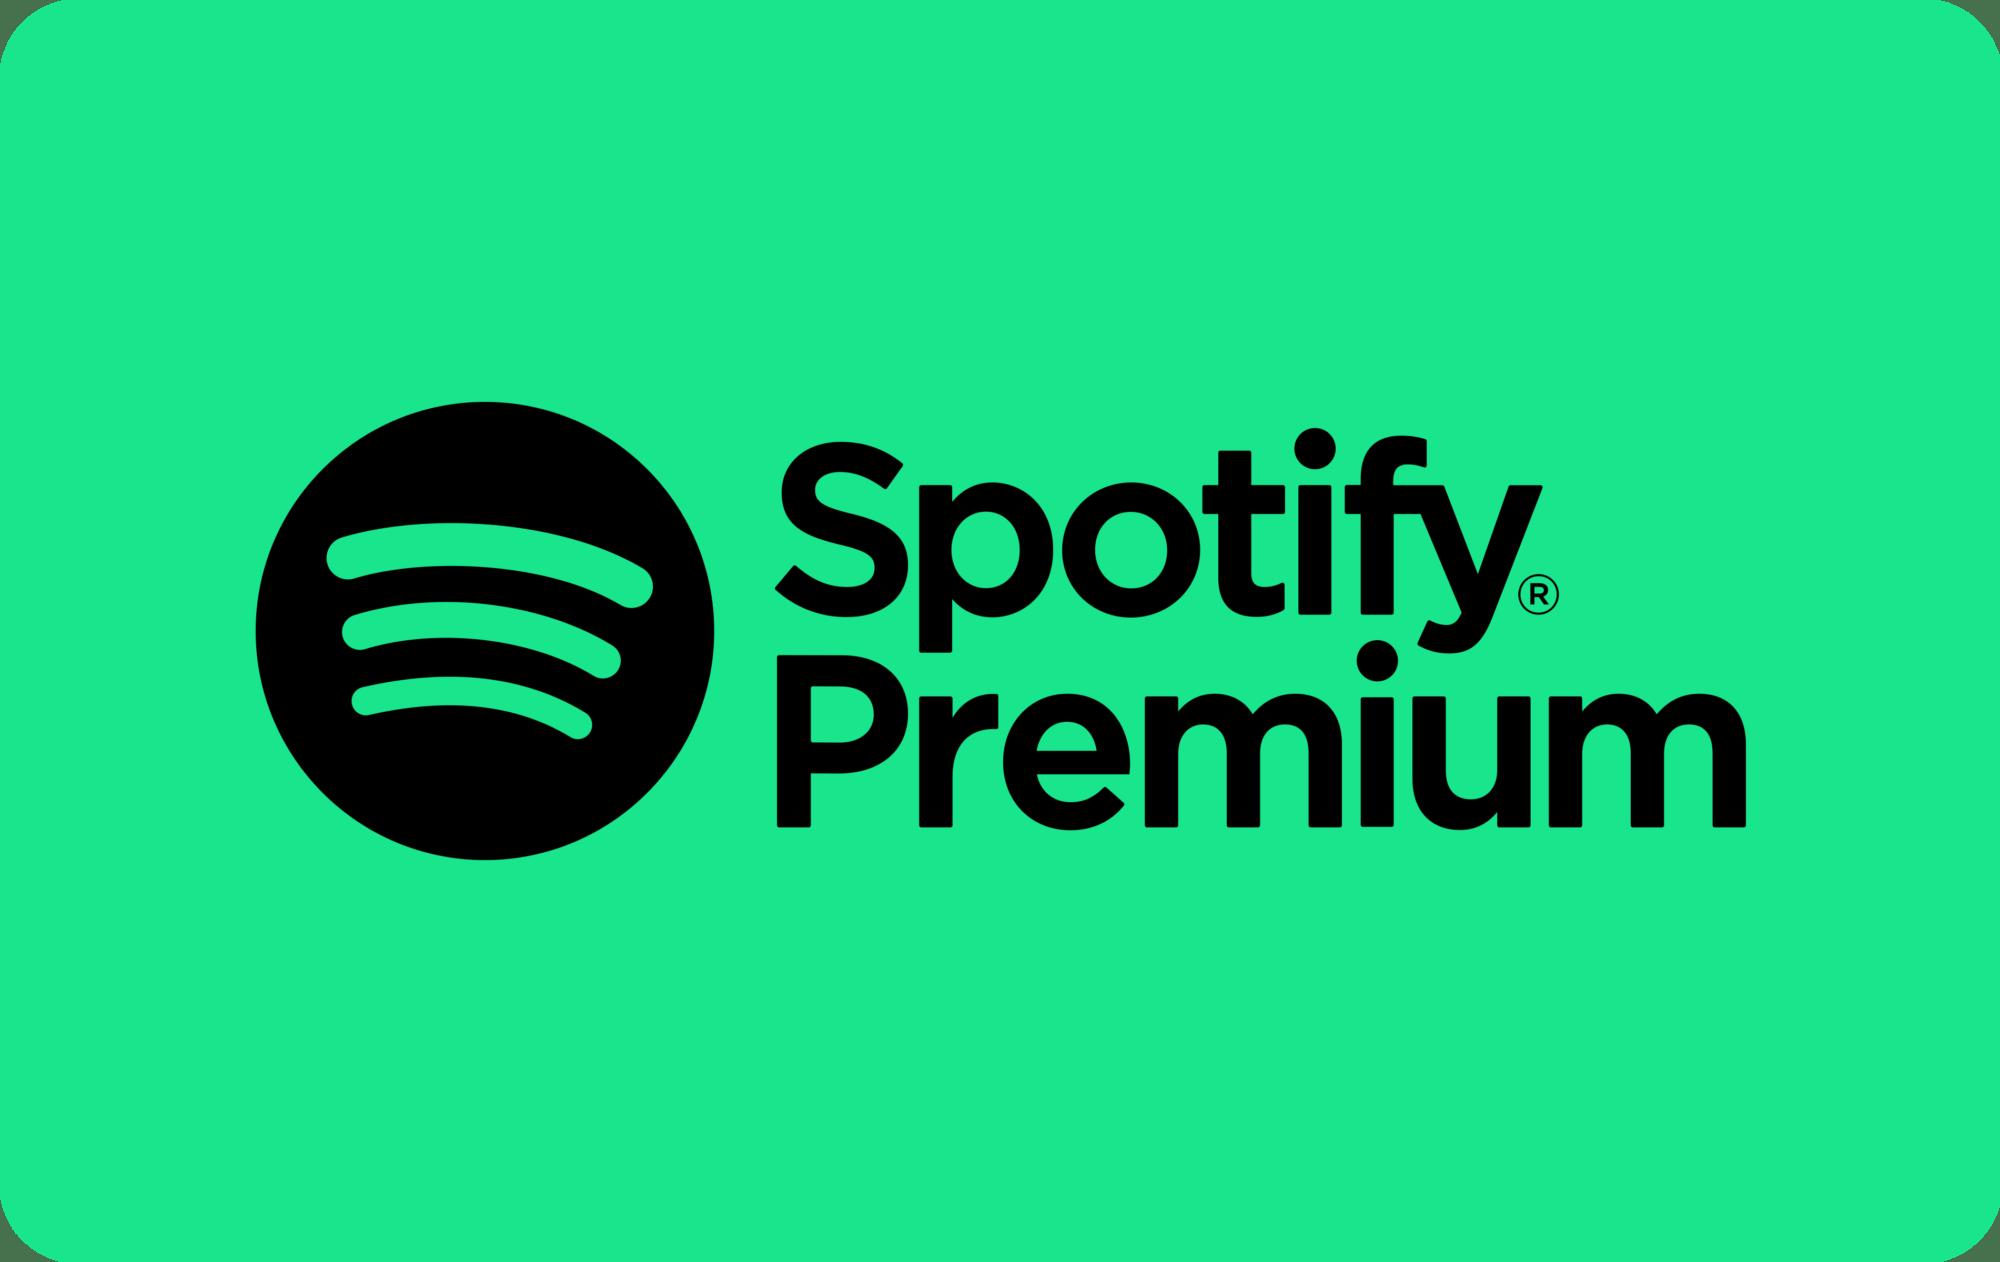 Spotify evid